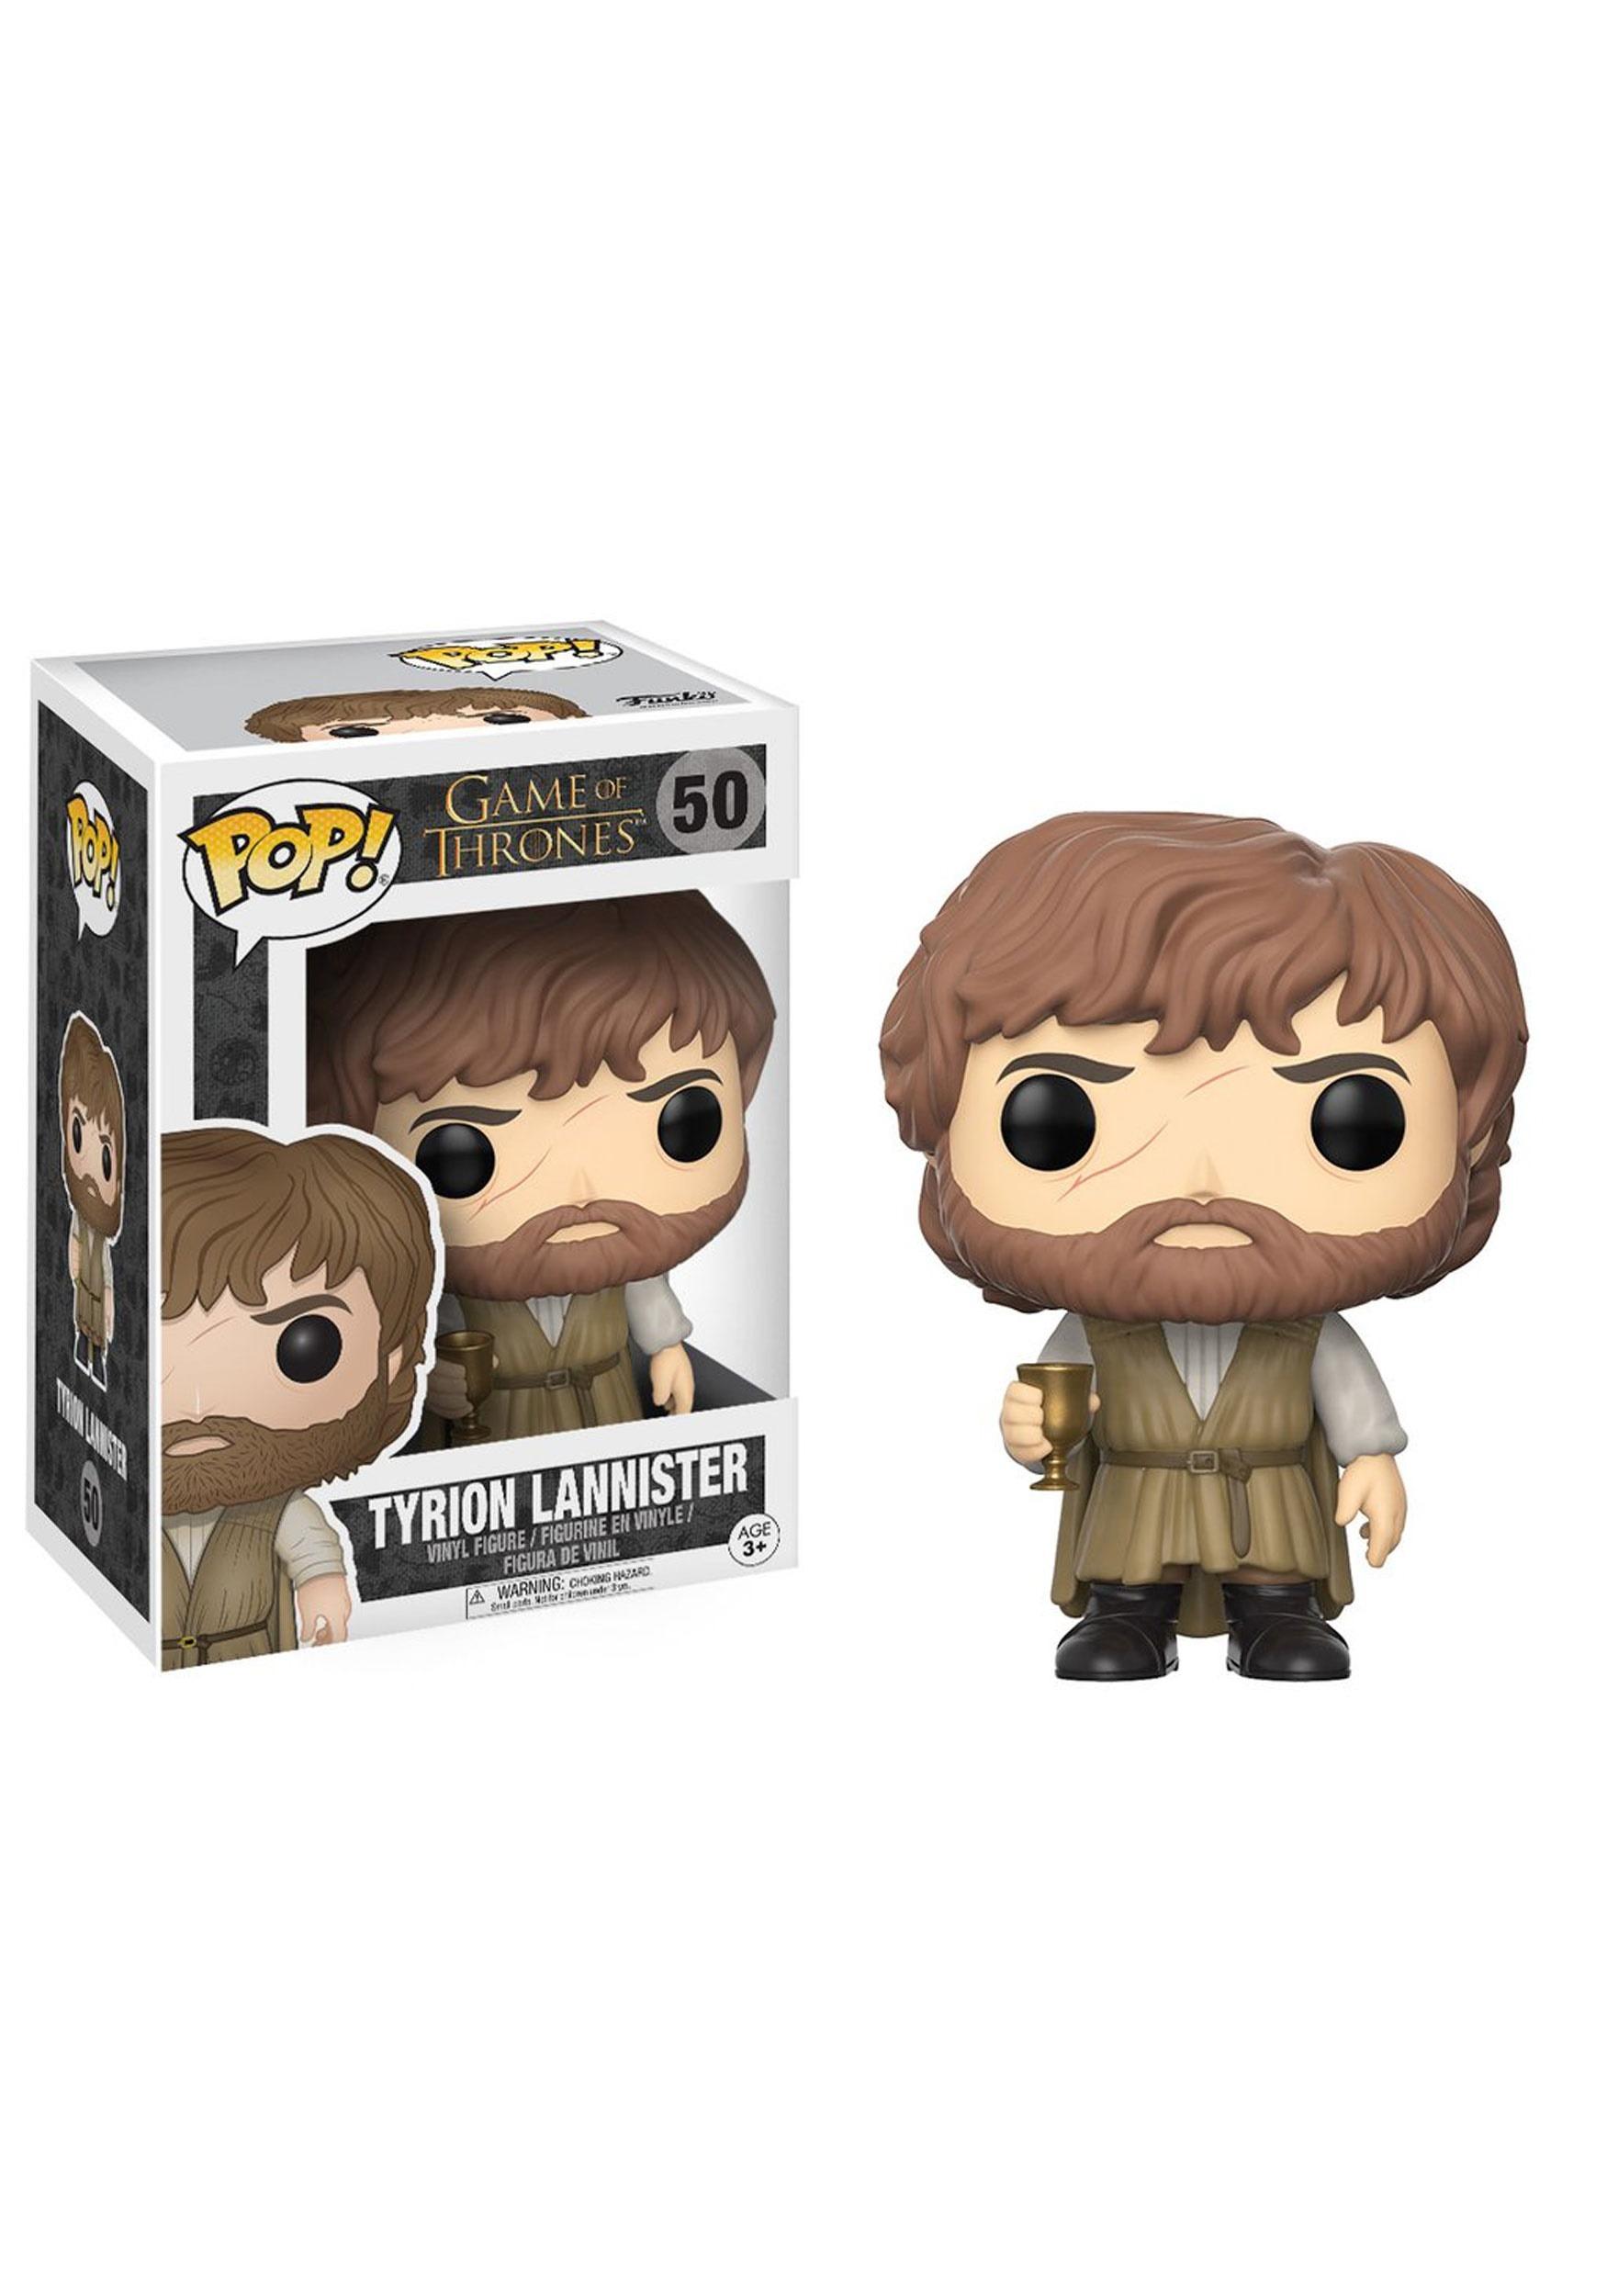 Game of Thrones Tyrion Lannister POP Vinyl Figure FN12216